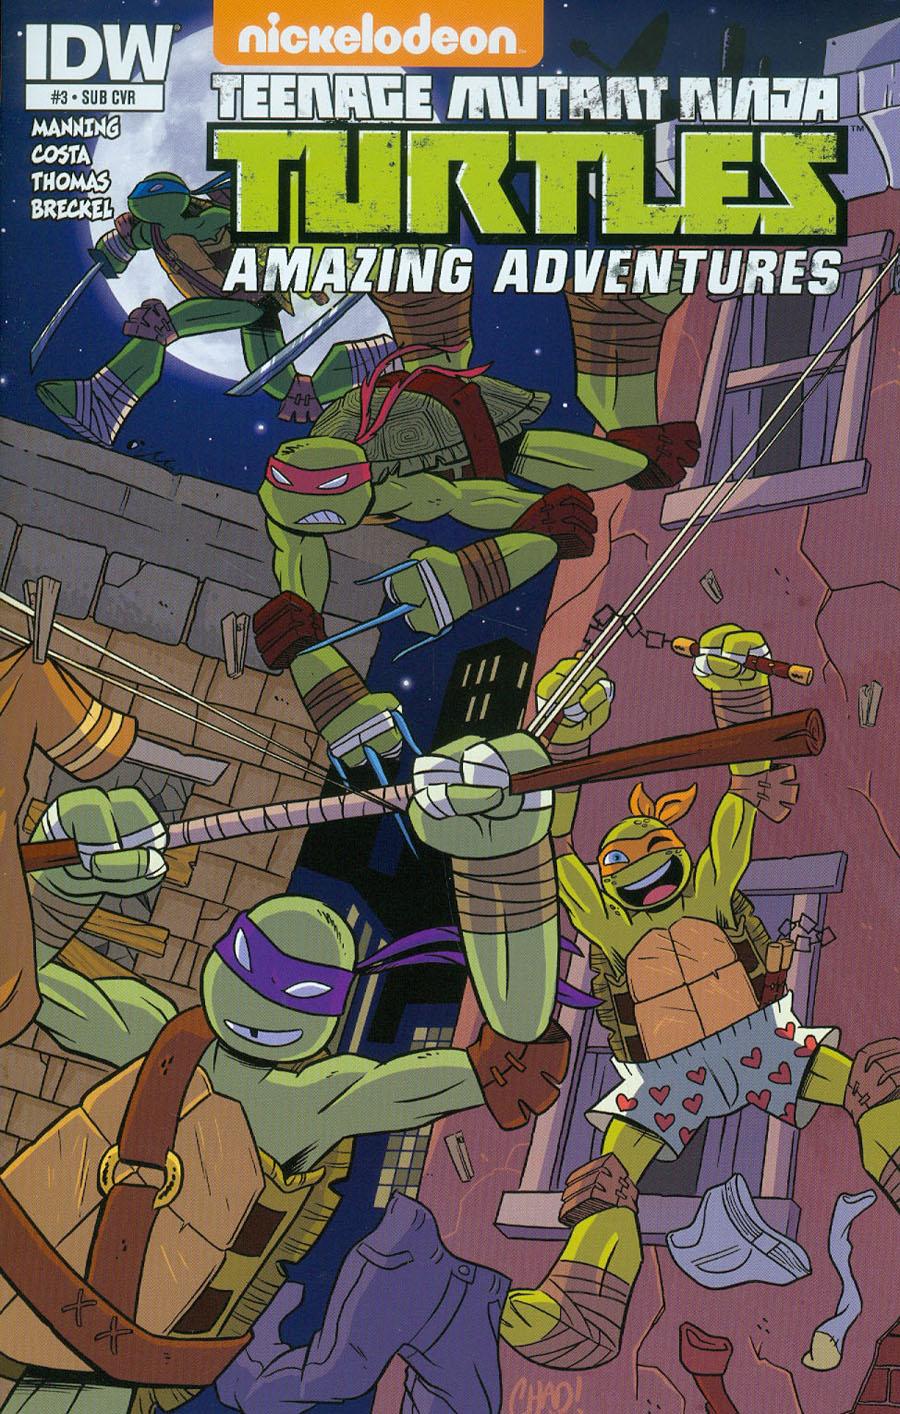 Teenage Mutant Ninja Turtles Amazing Adventures #3 Cover B Variant Chad Thomas Subscription Cover